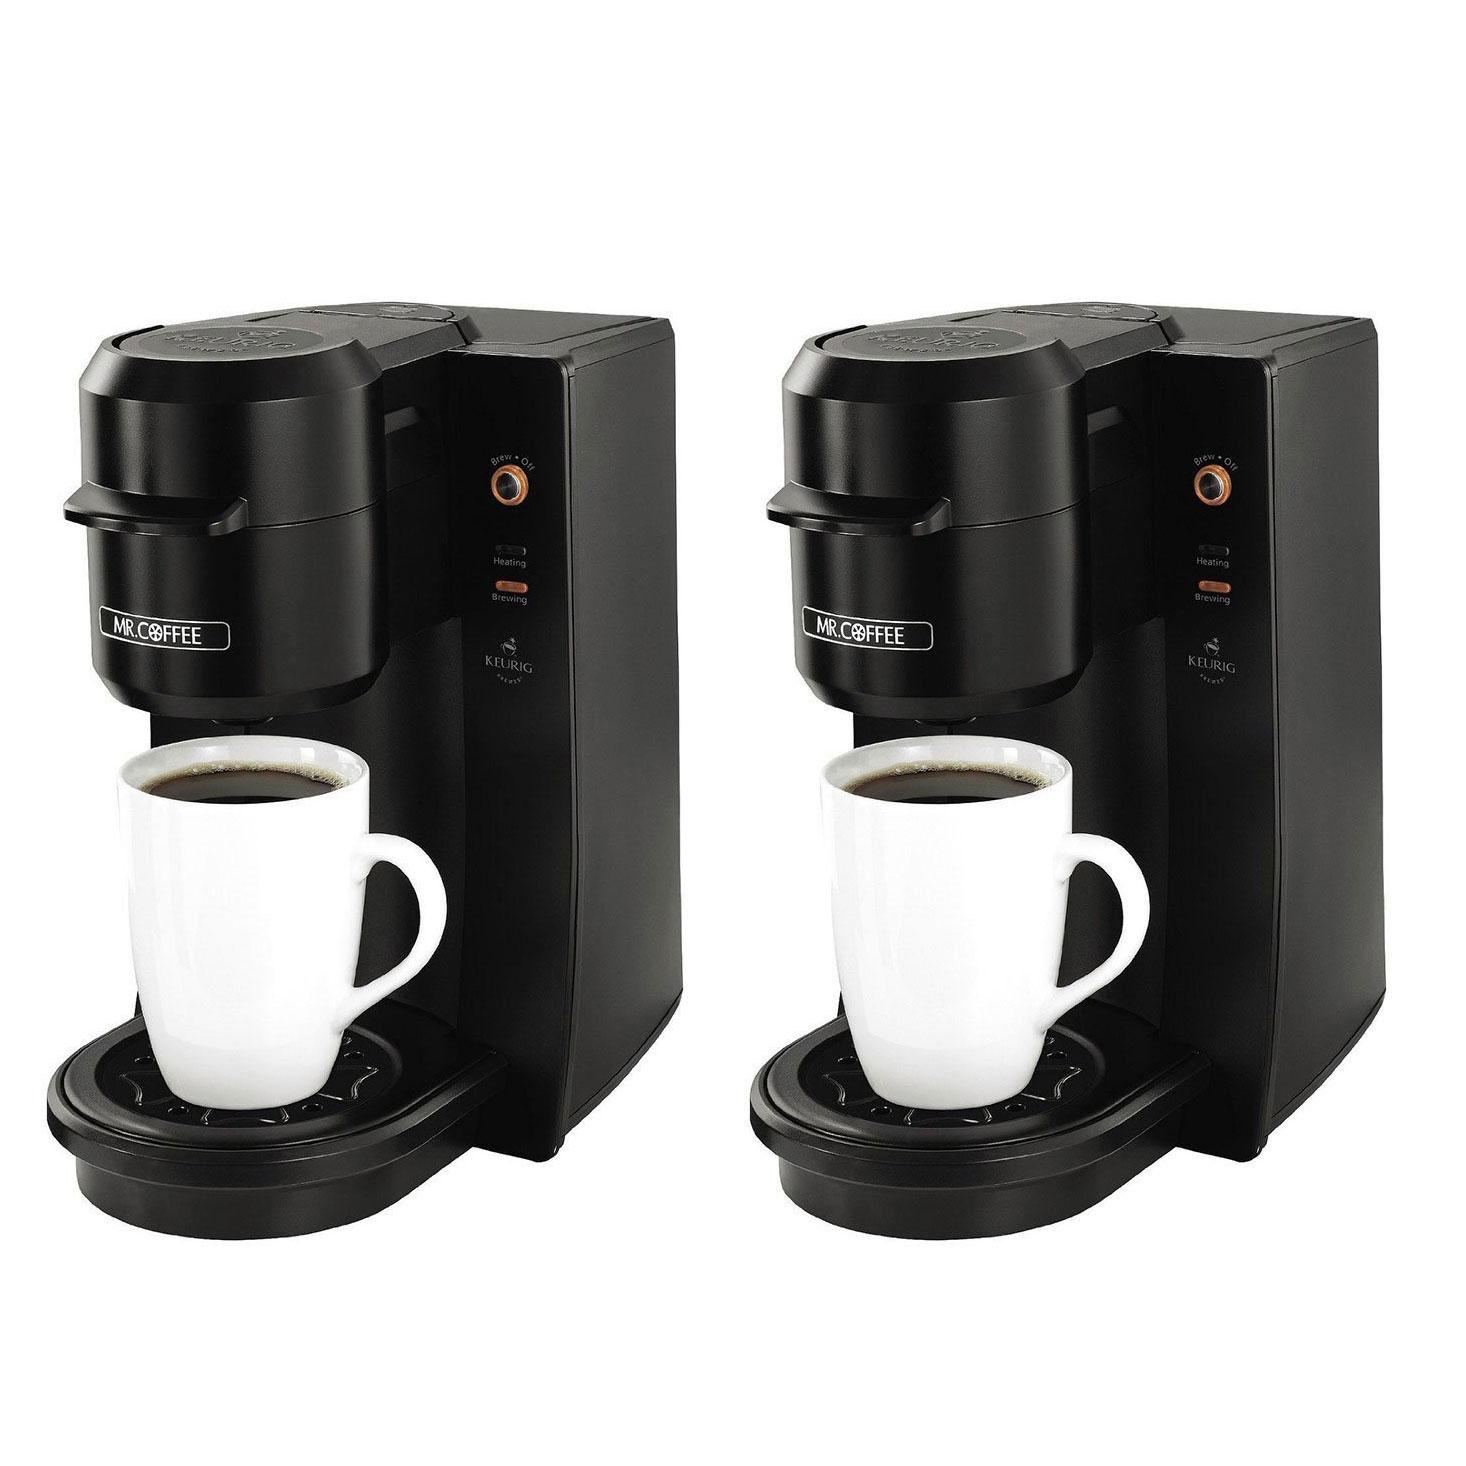 Mr Coffee Single Serve 93 Ounce Black Coffee Maker Brewer Machine